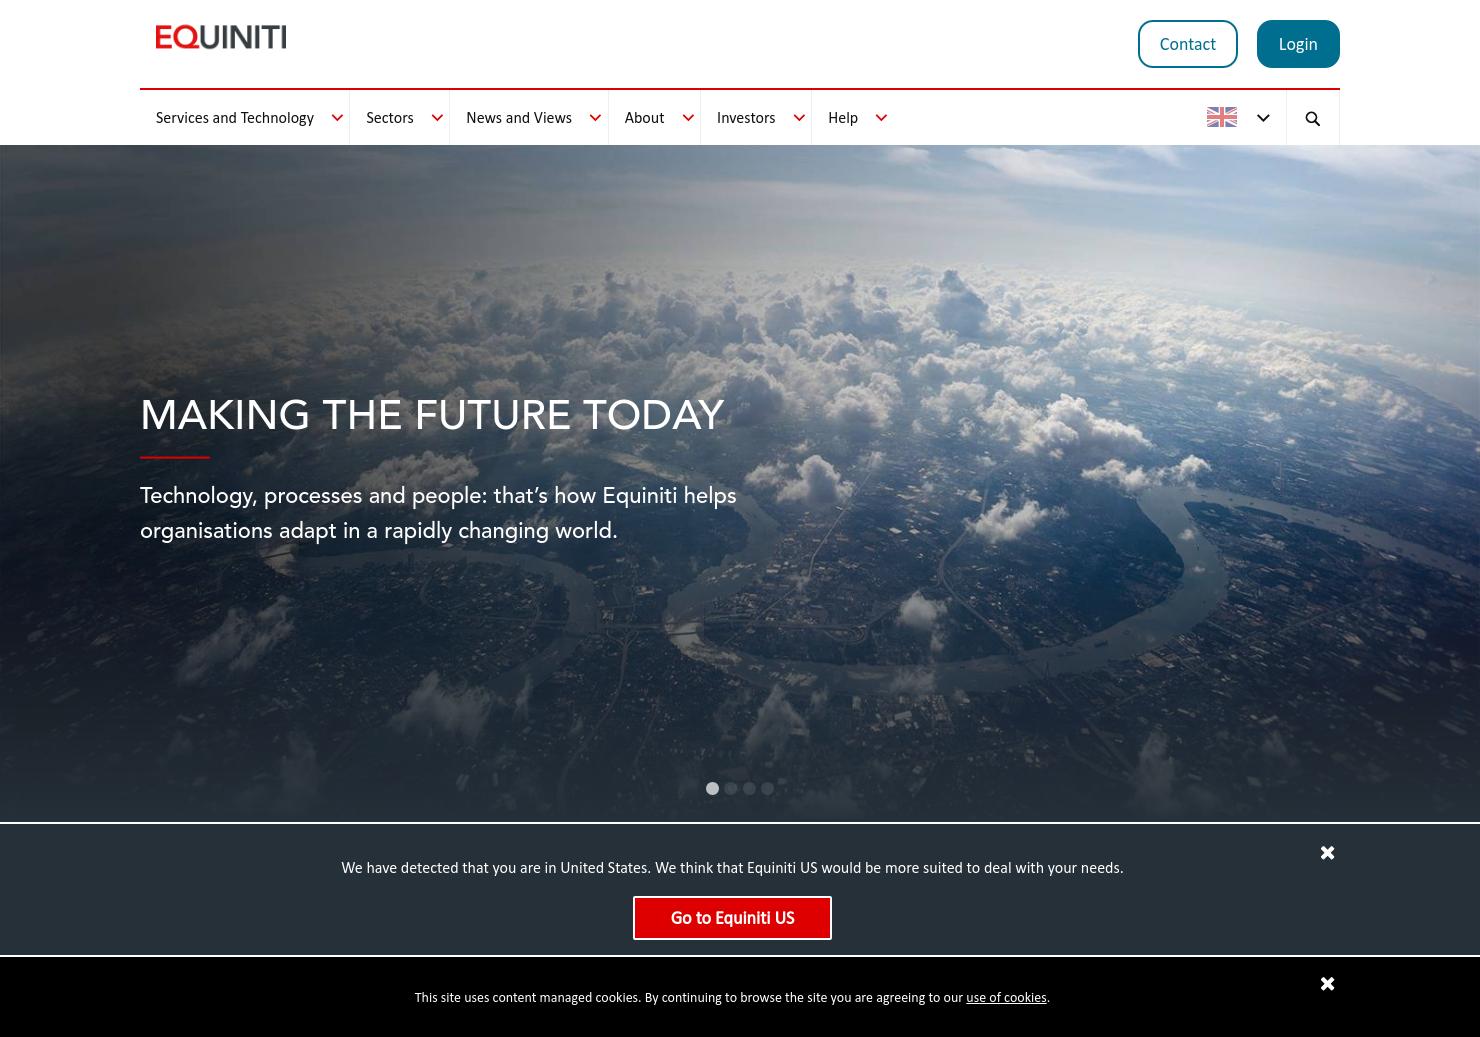 Equiniti Home Page